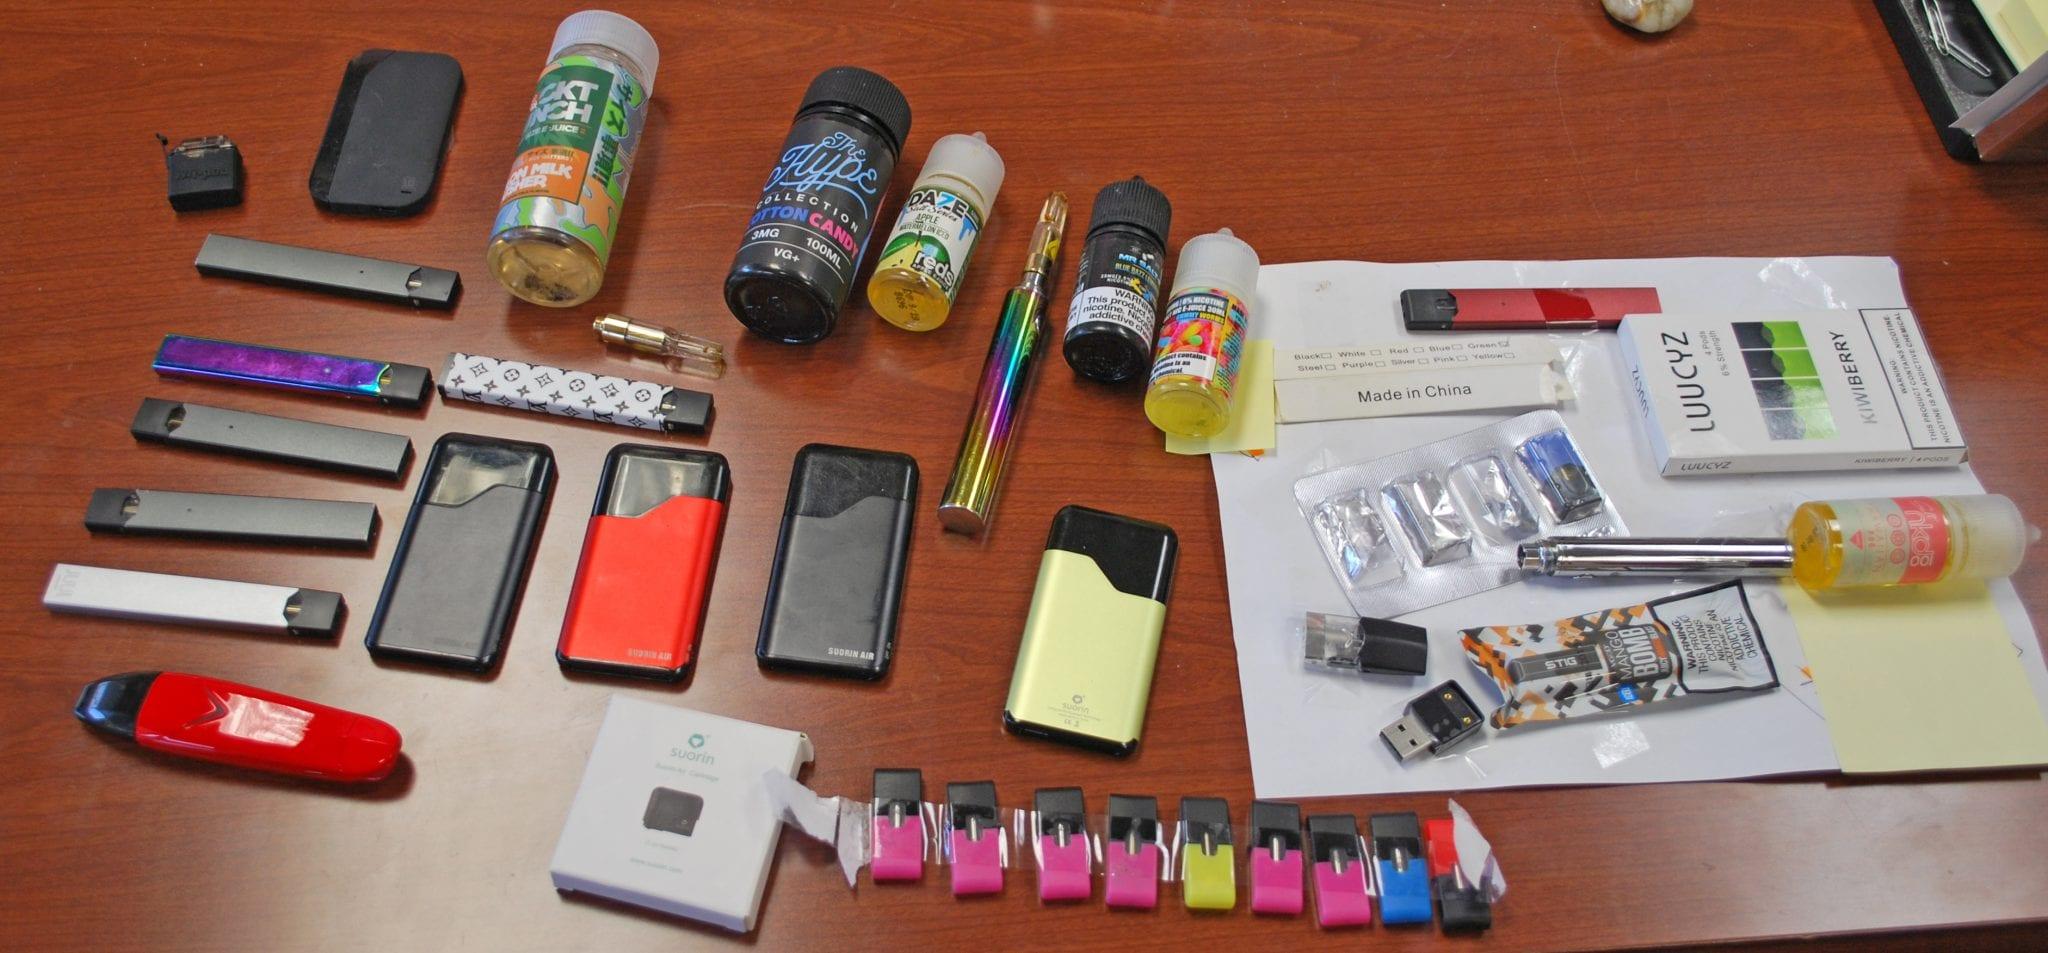 A couple dozen vaping devices are shown on a desk.